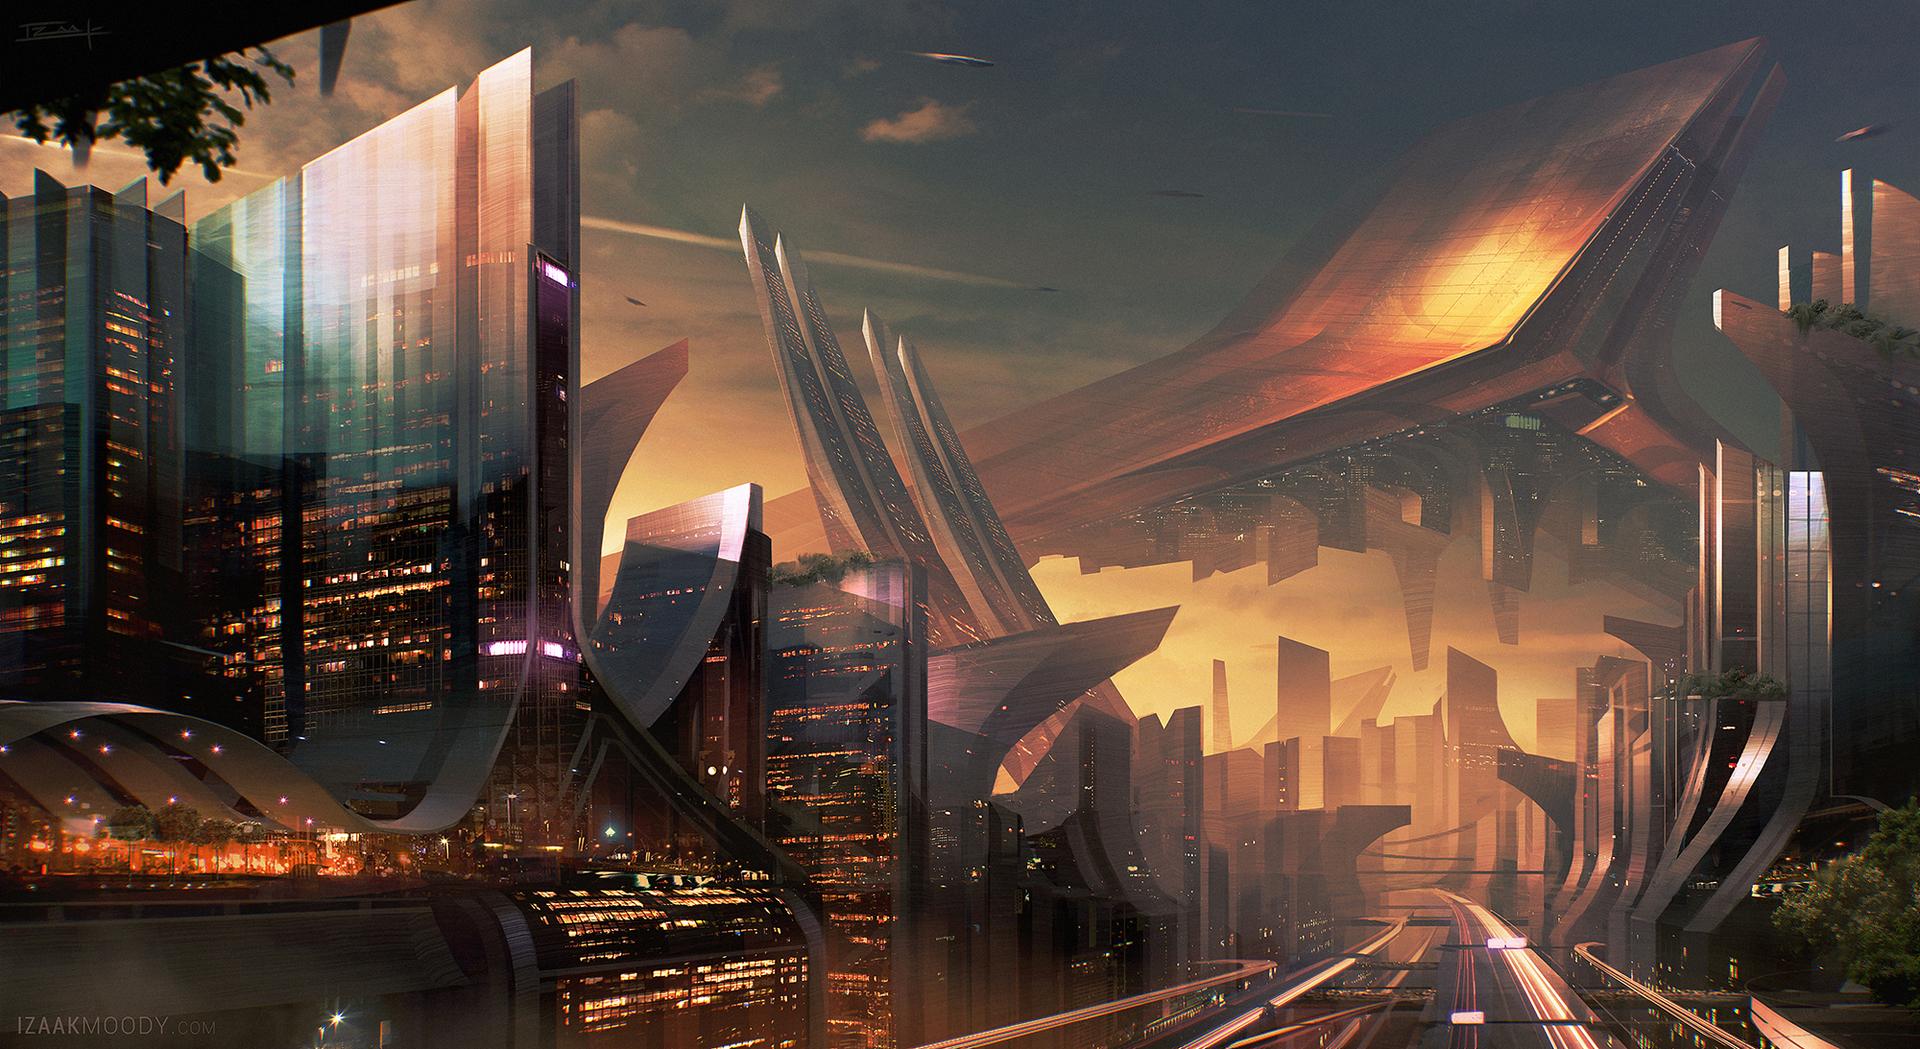 Earthscrapers